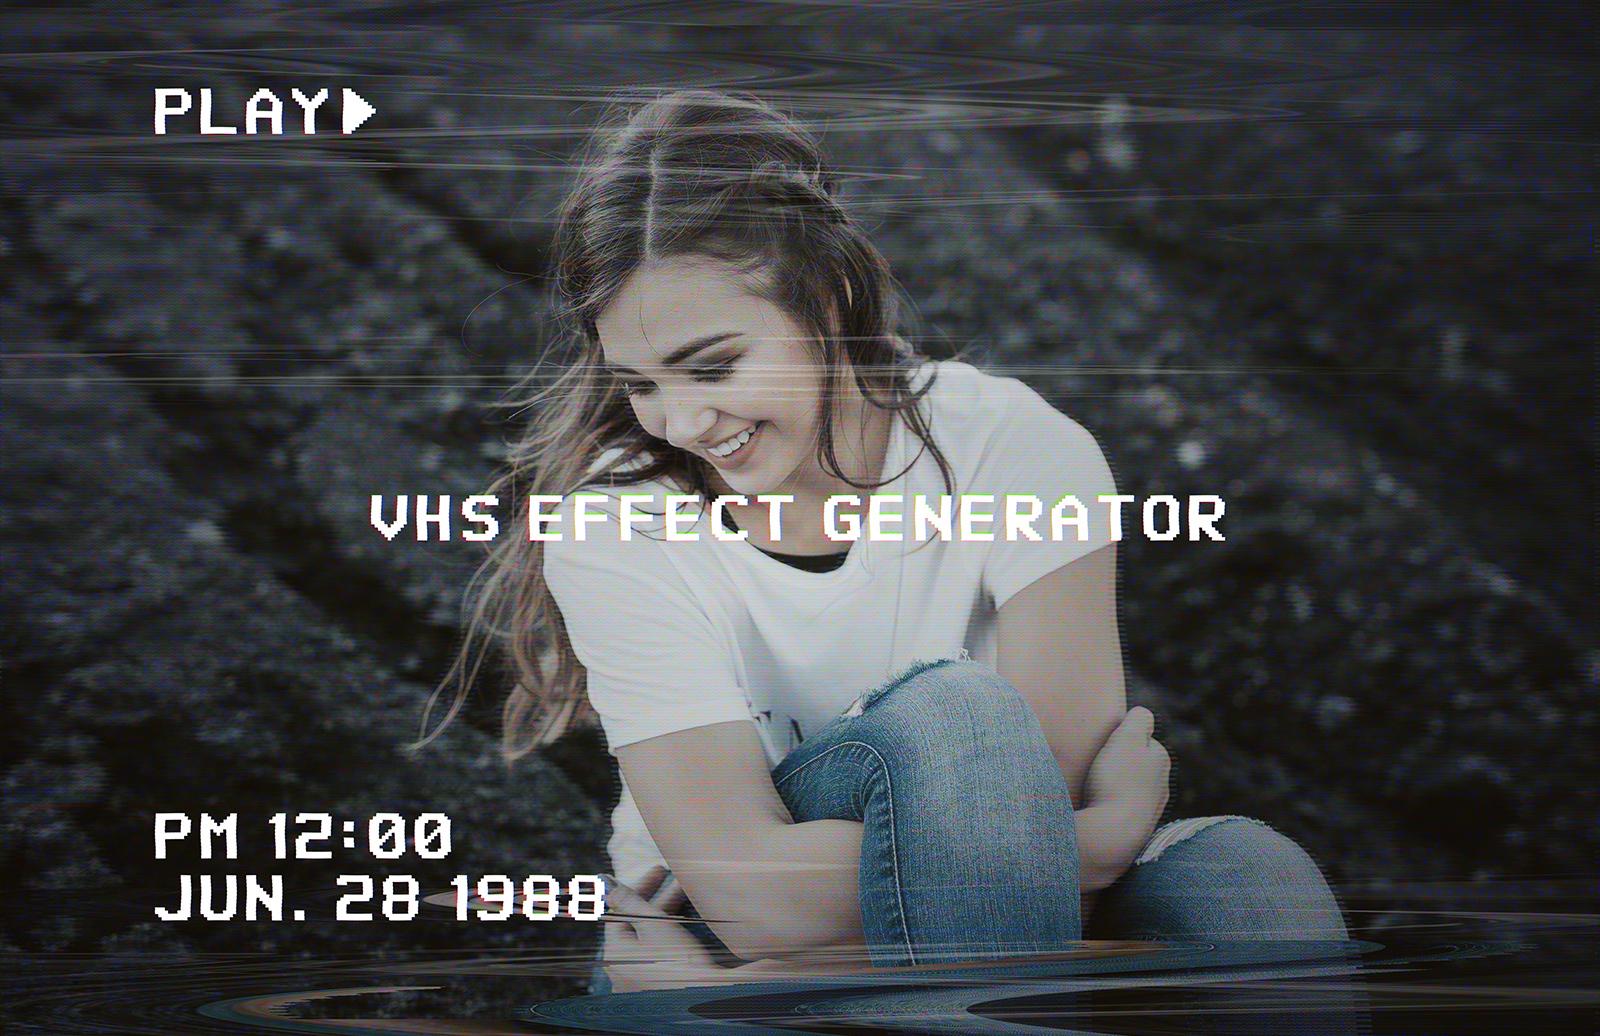 VHS Image Effect Generator